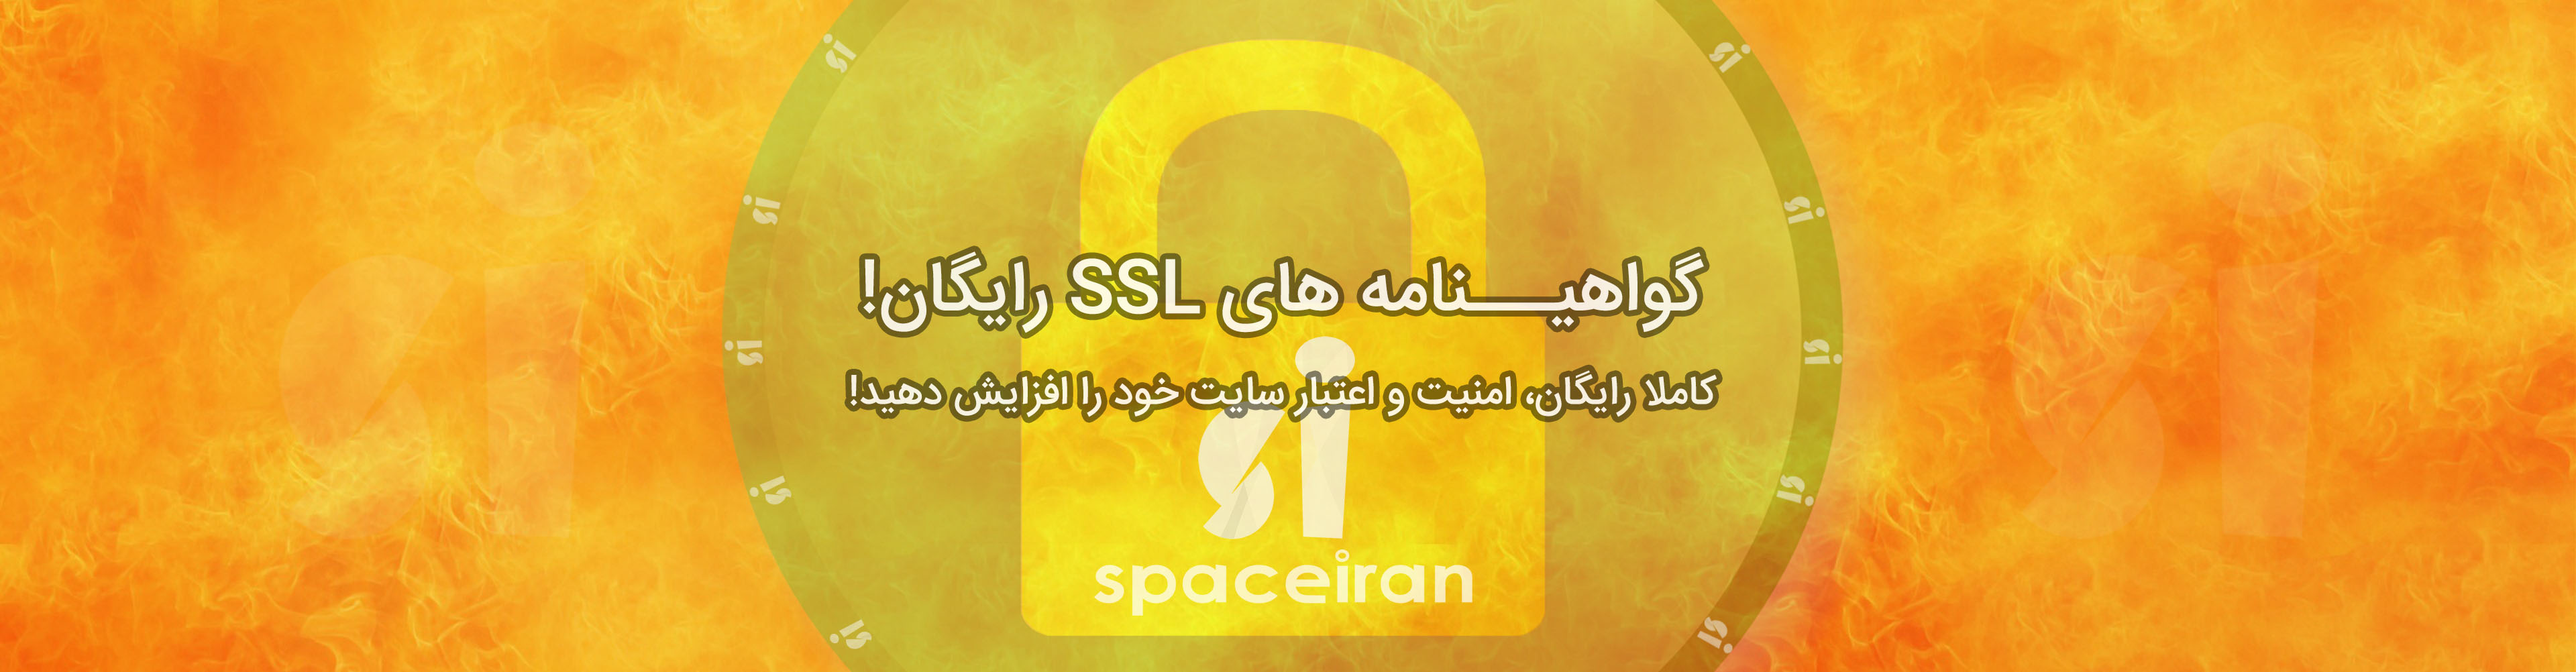 spaceiran-free-ssl